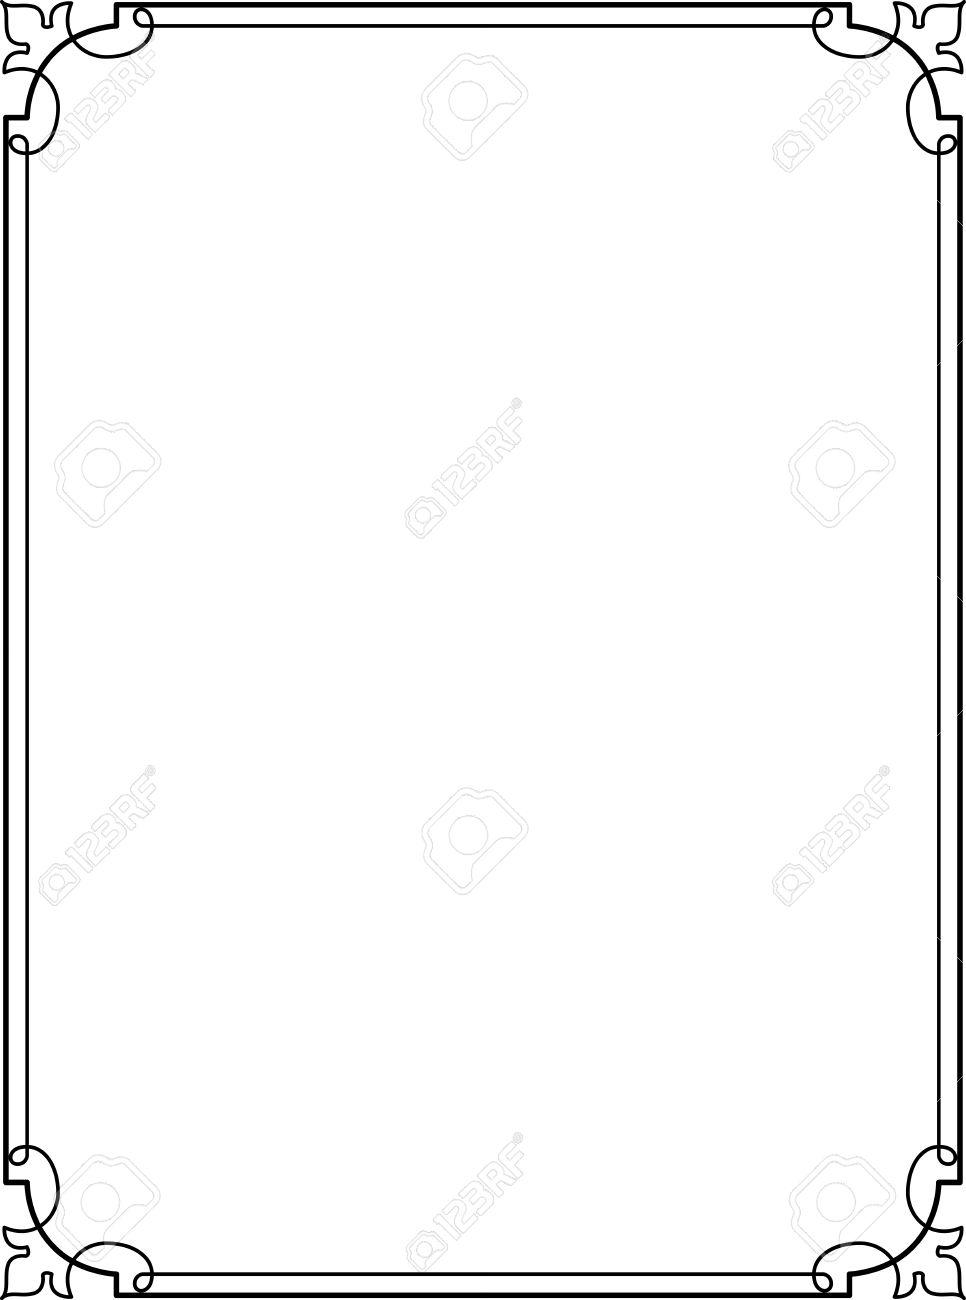 Simple Frame Border Design Lines Vector Stock 24306548 O